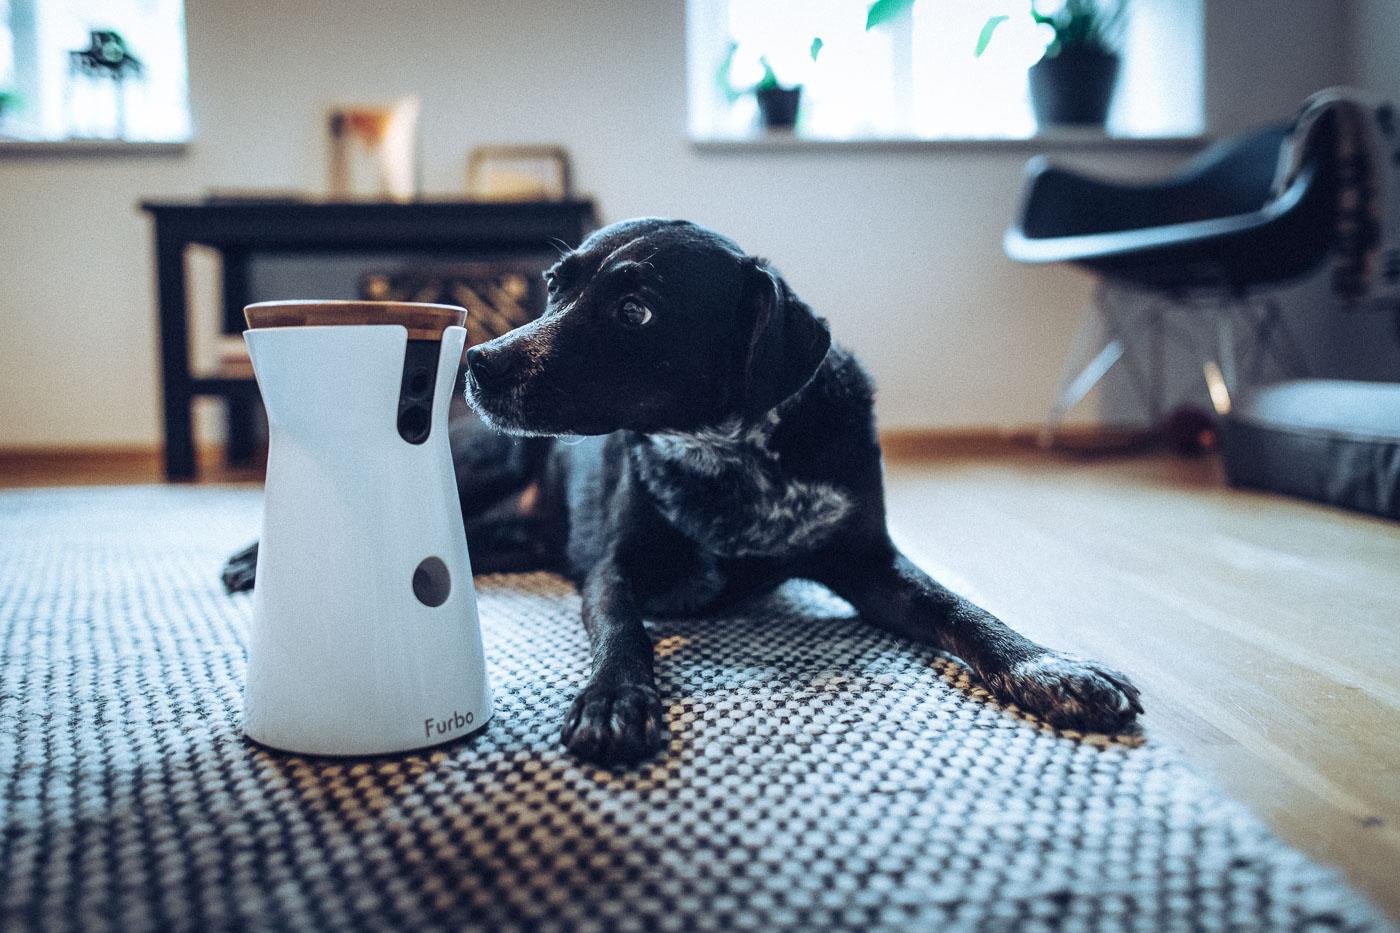 Hund beschnüffelt die Furbo Hundekamera